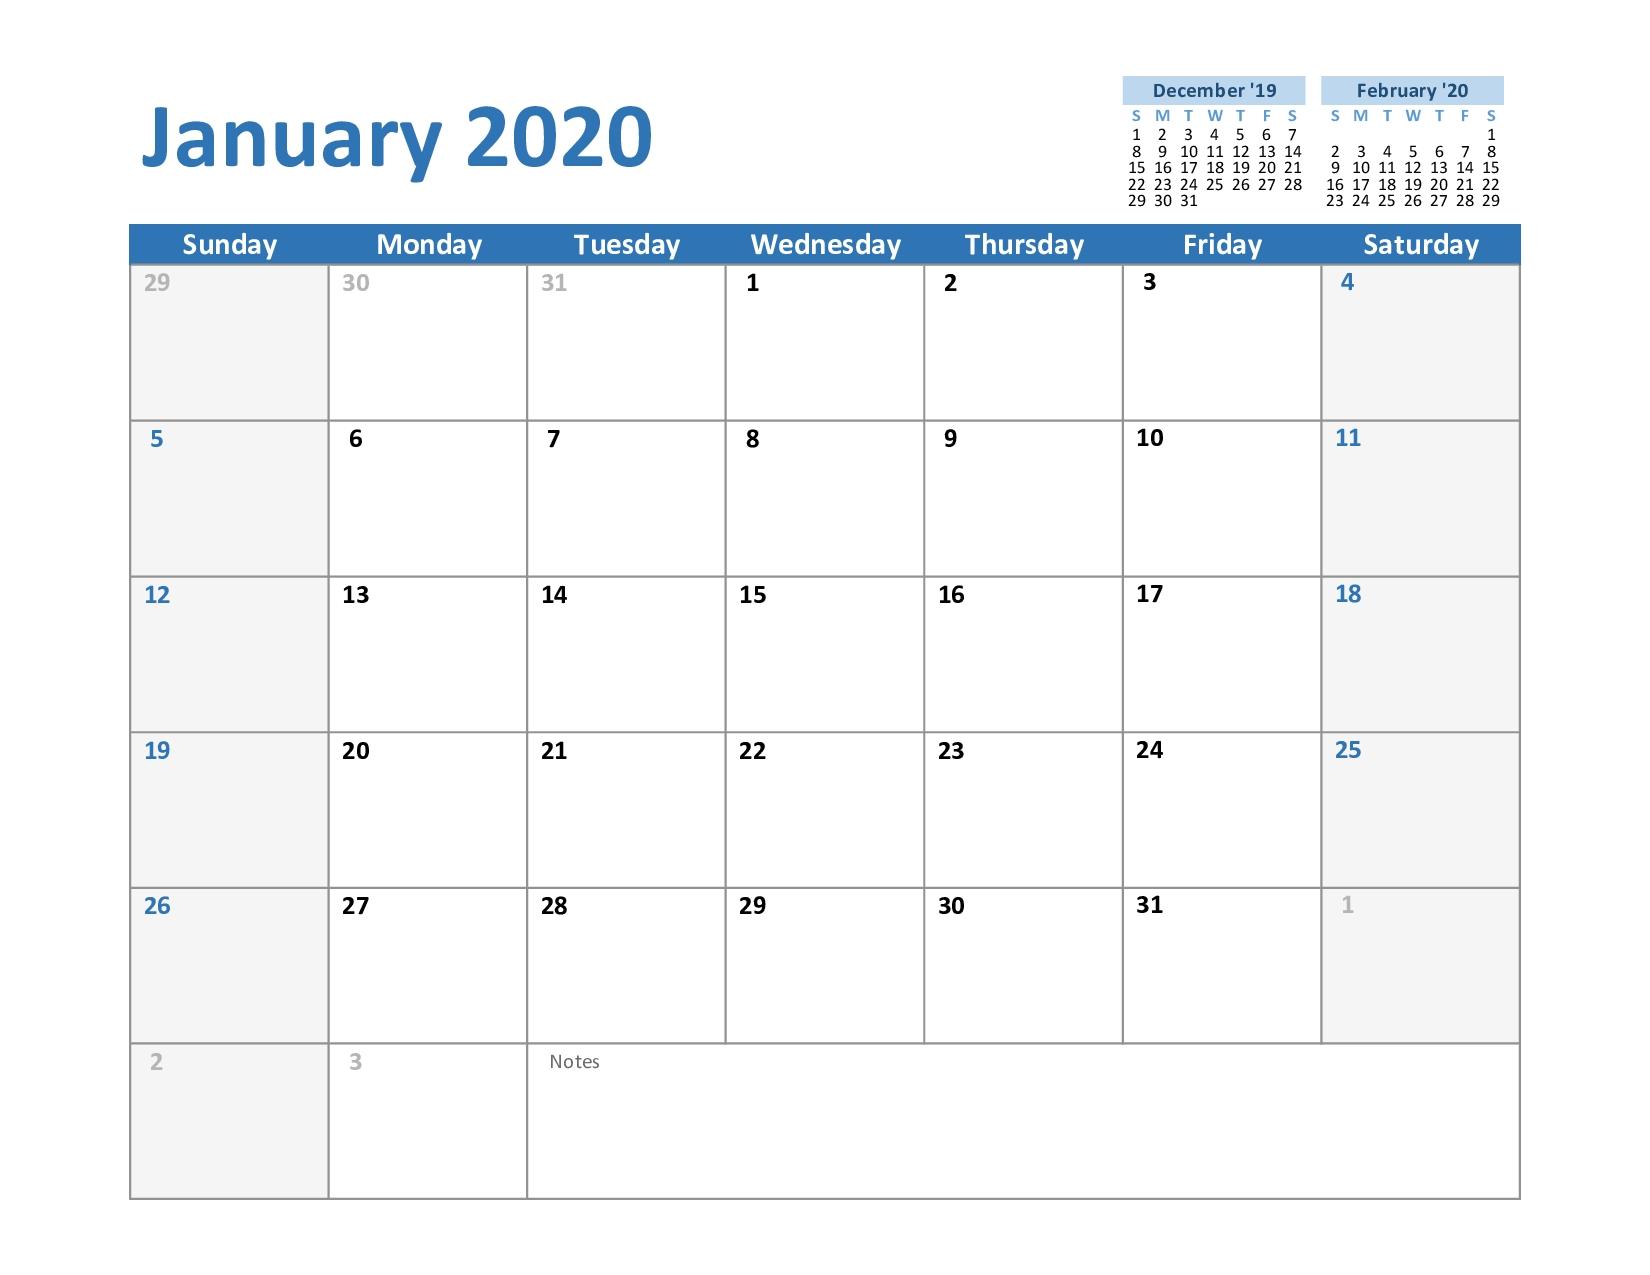 Printable January 2020 Calendar - Free Blank Templates-Print Blank Attendance Calendar 2020